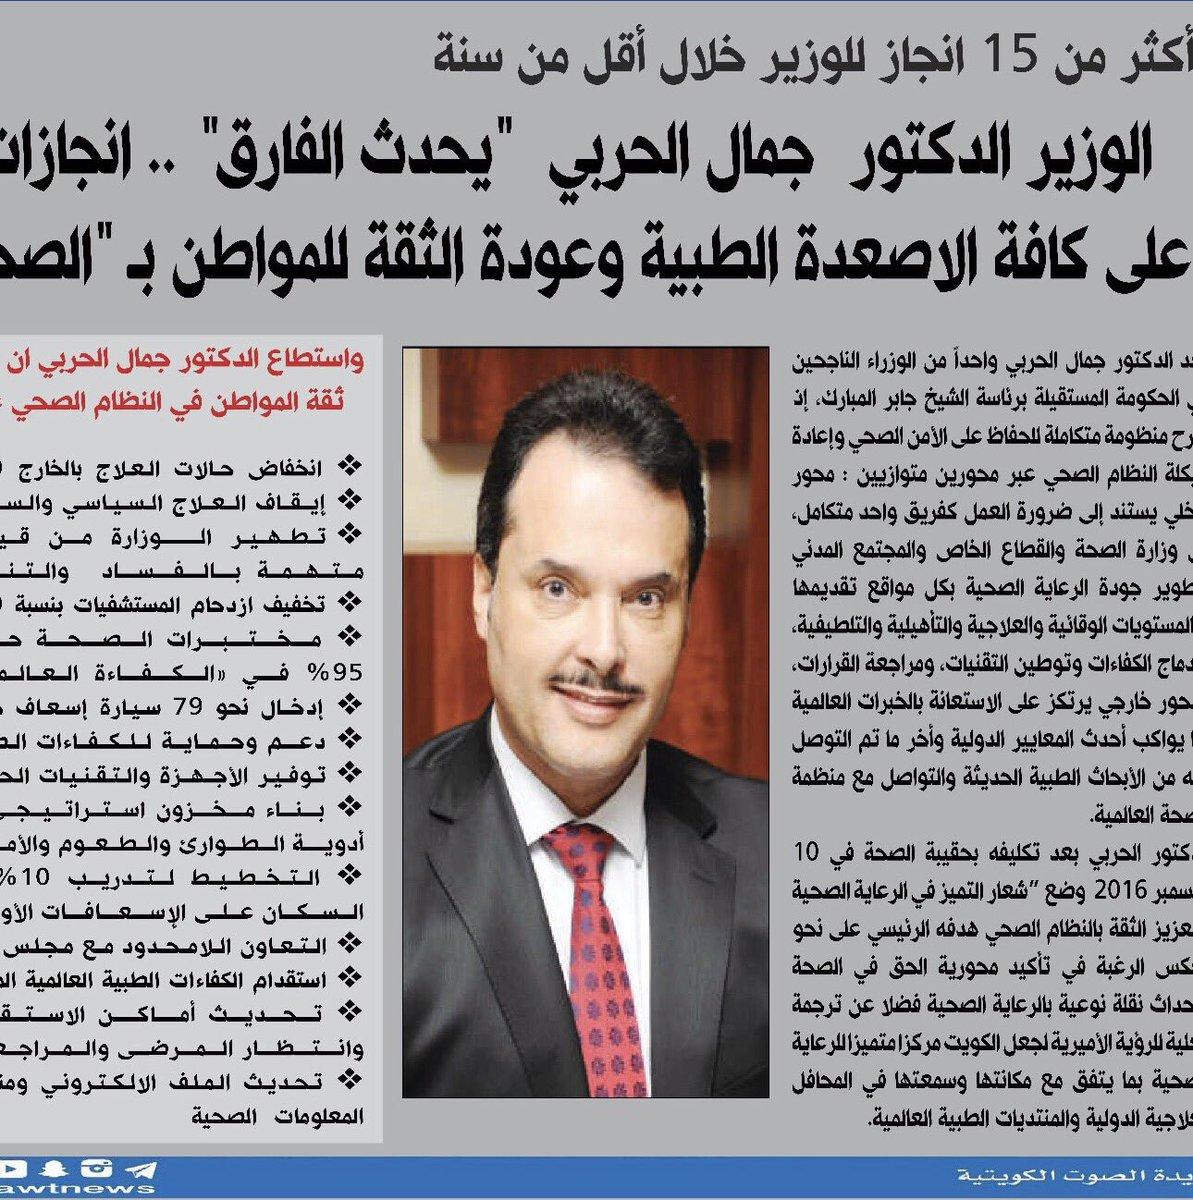 Abdulaziz AlZaid aziz kuw